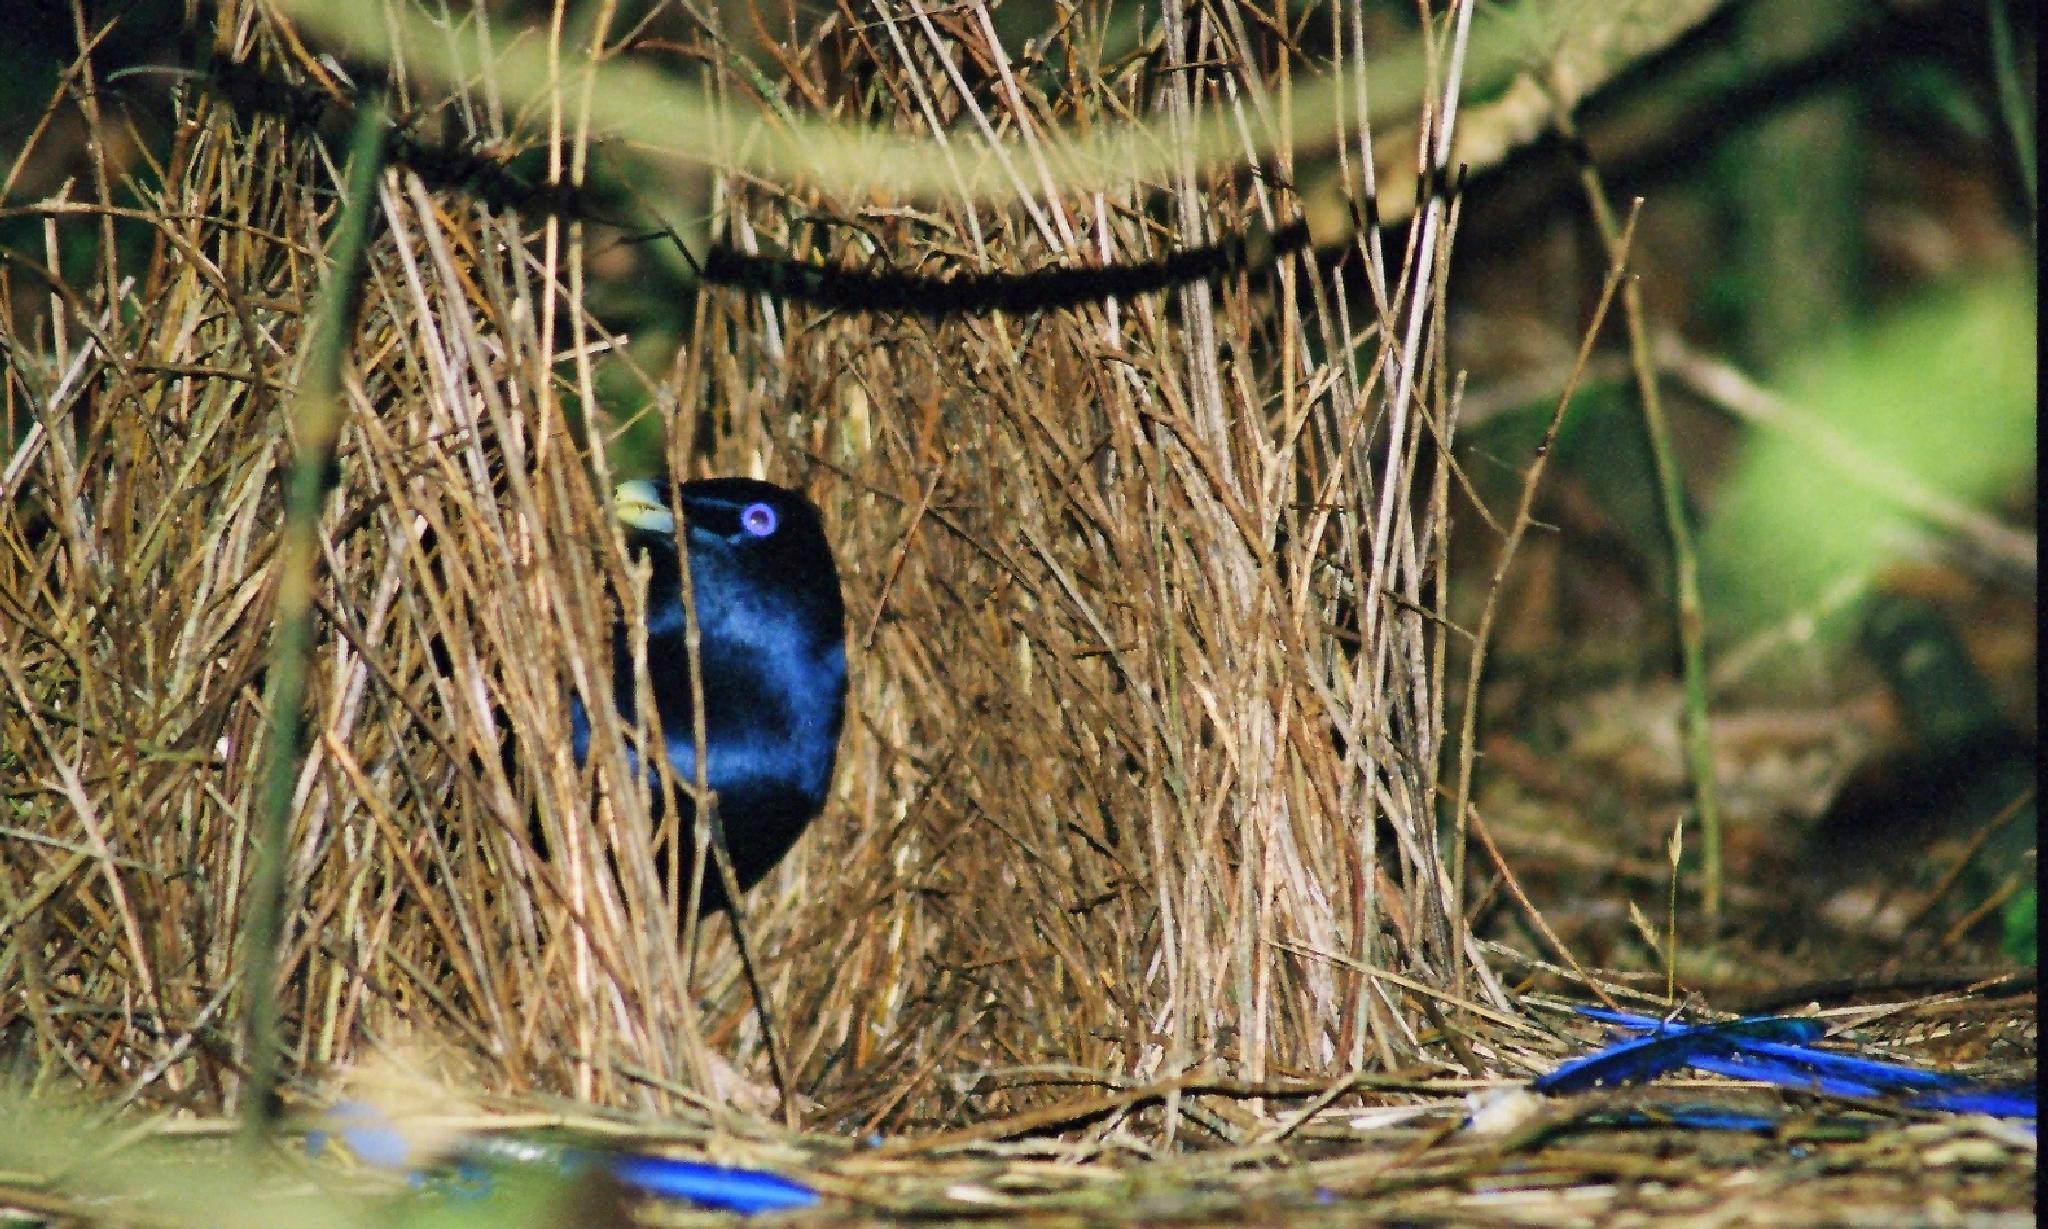 Satin bower bird by Jamie Mills